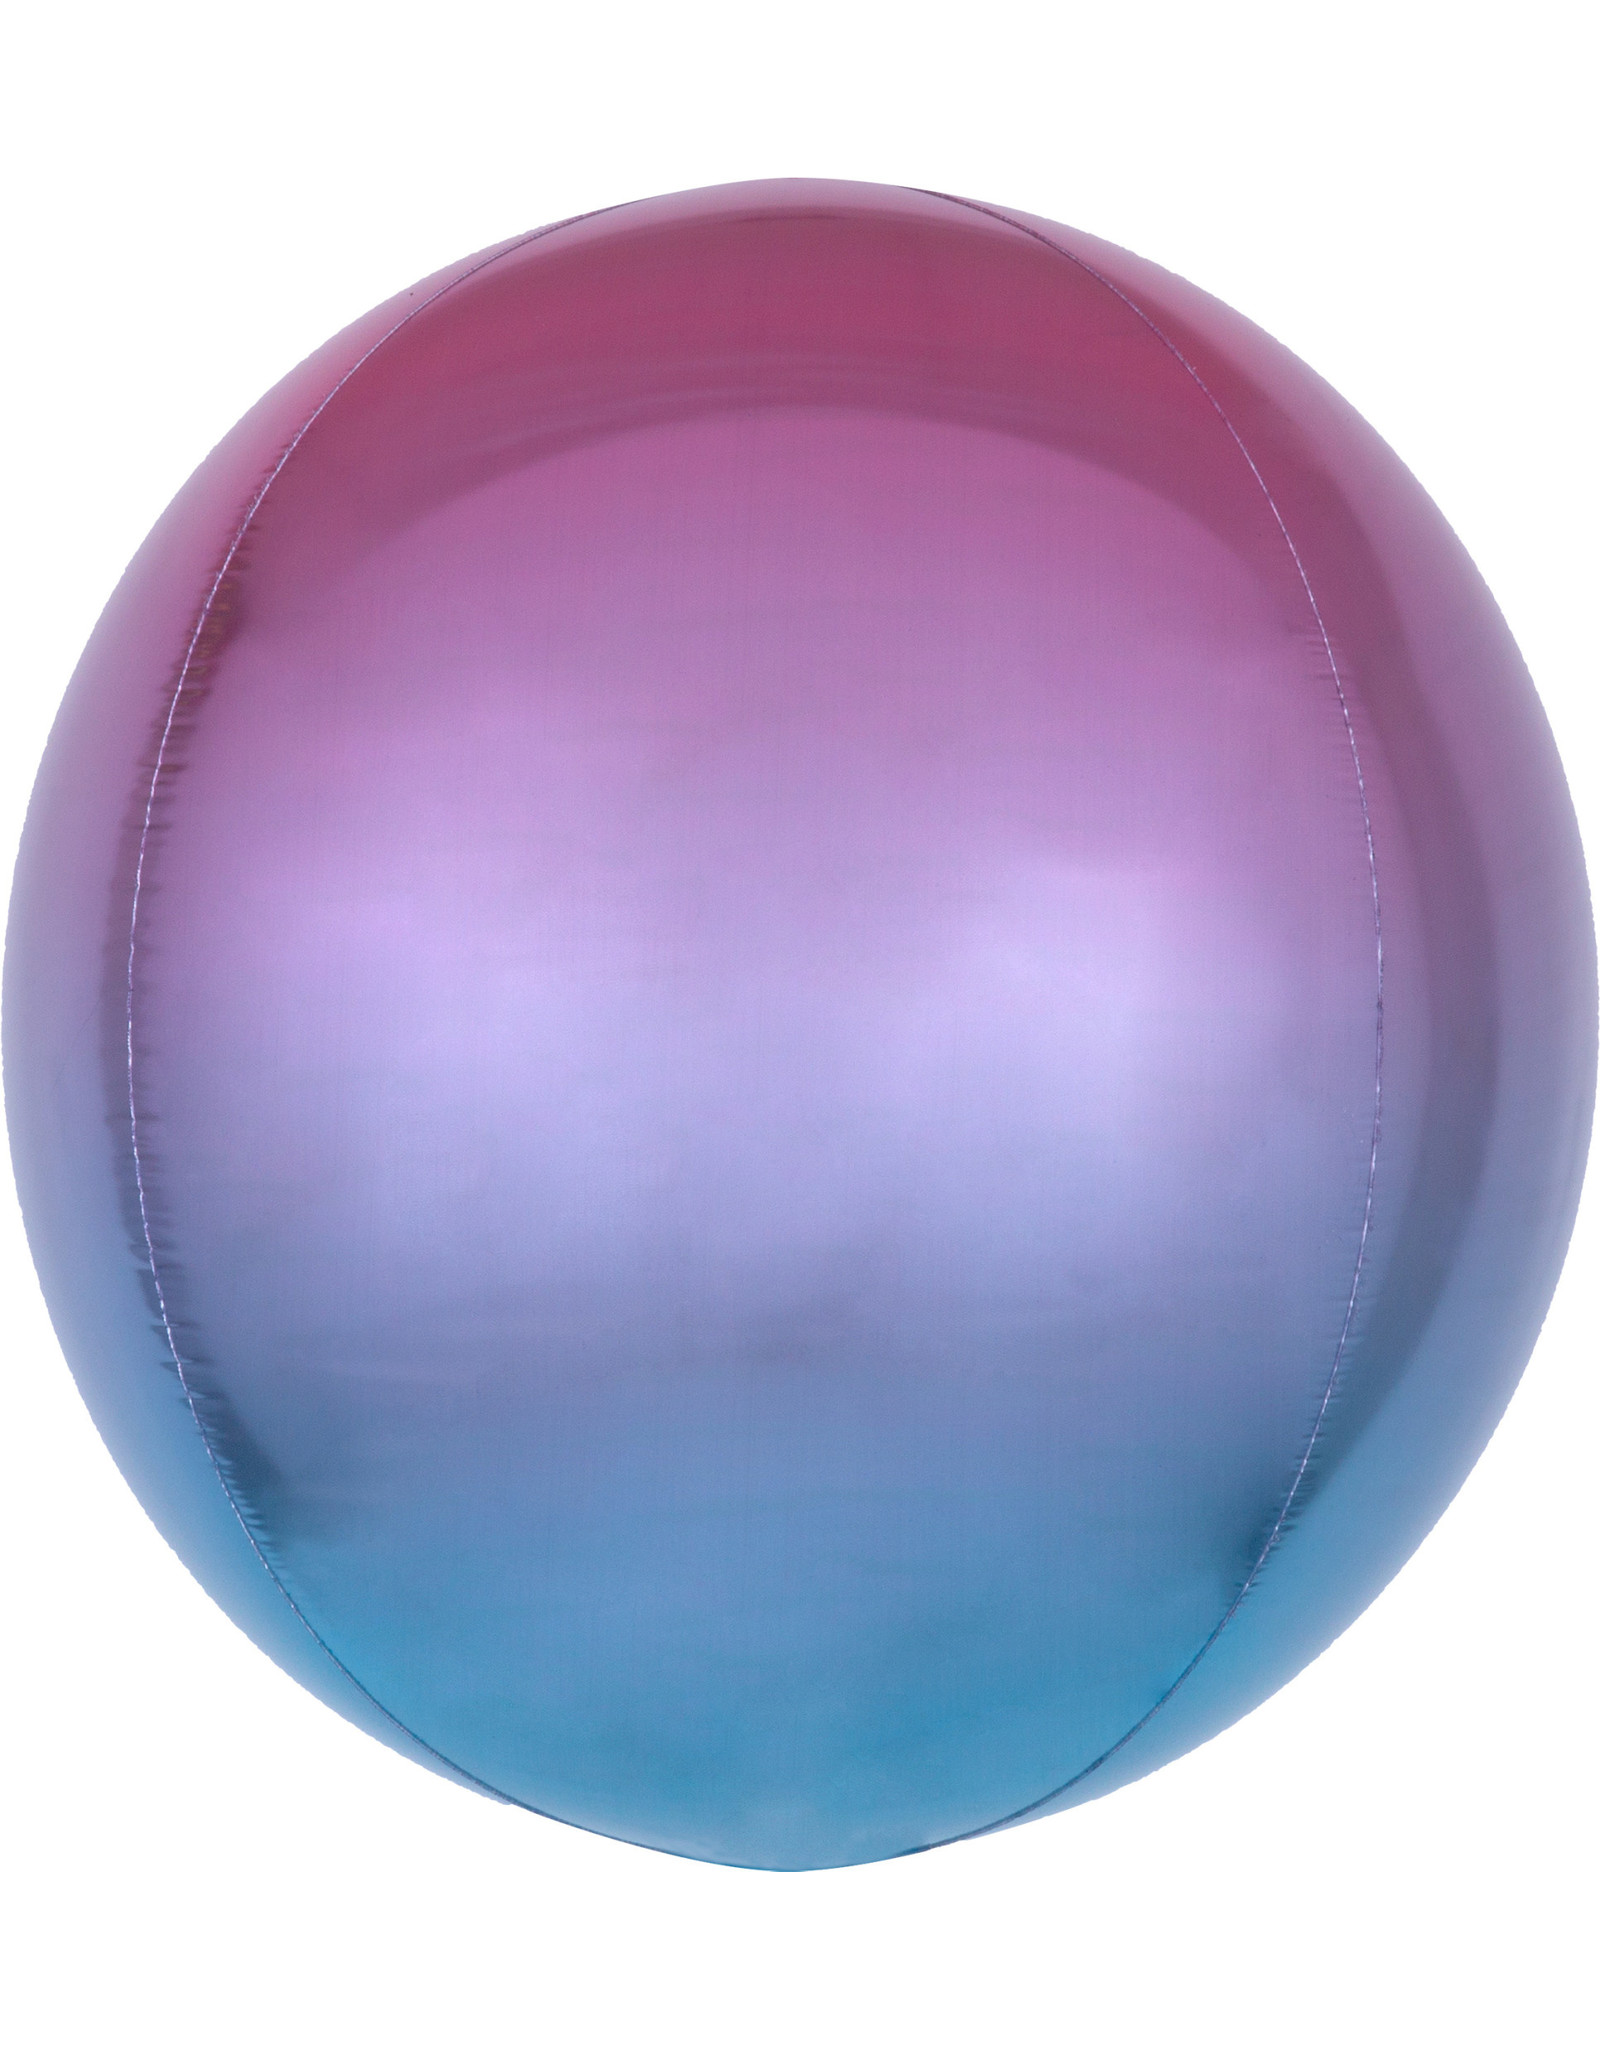 Amscan folieballon orbz blauw paars roze 38 x 38 cm